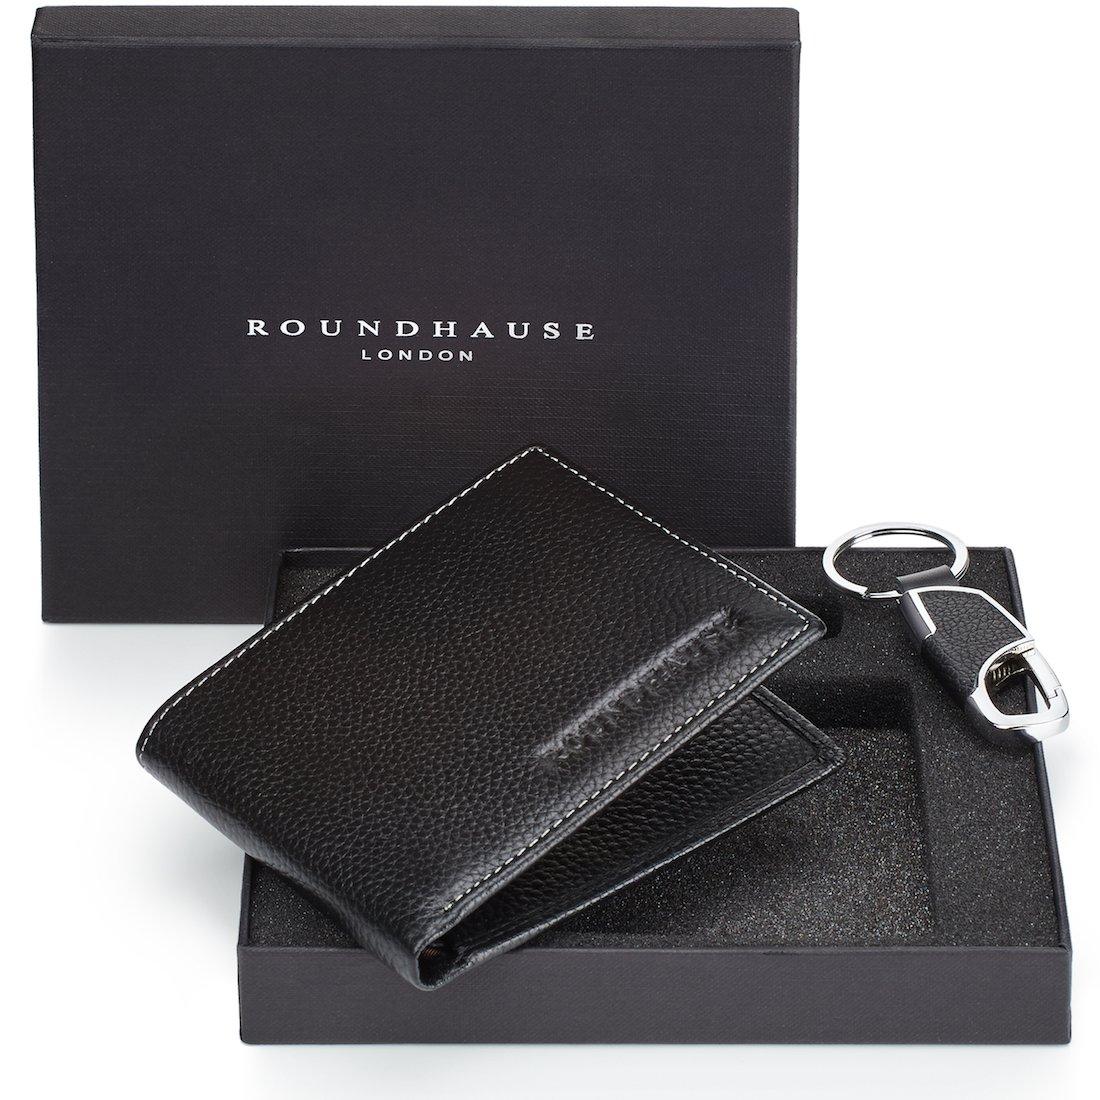 110efa89756f Roundhause Black Designer Slim Bi fold Mens RFID Blocking Wallet Real  Leather Credit Card Holder Organiser